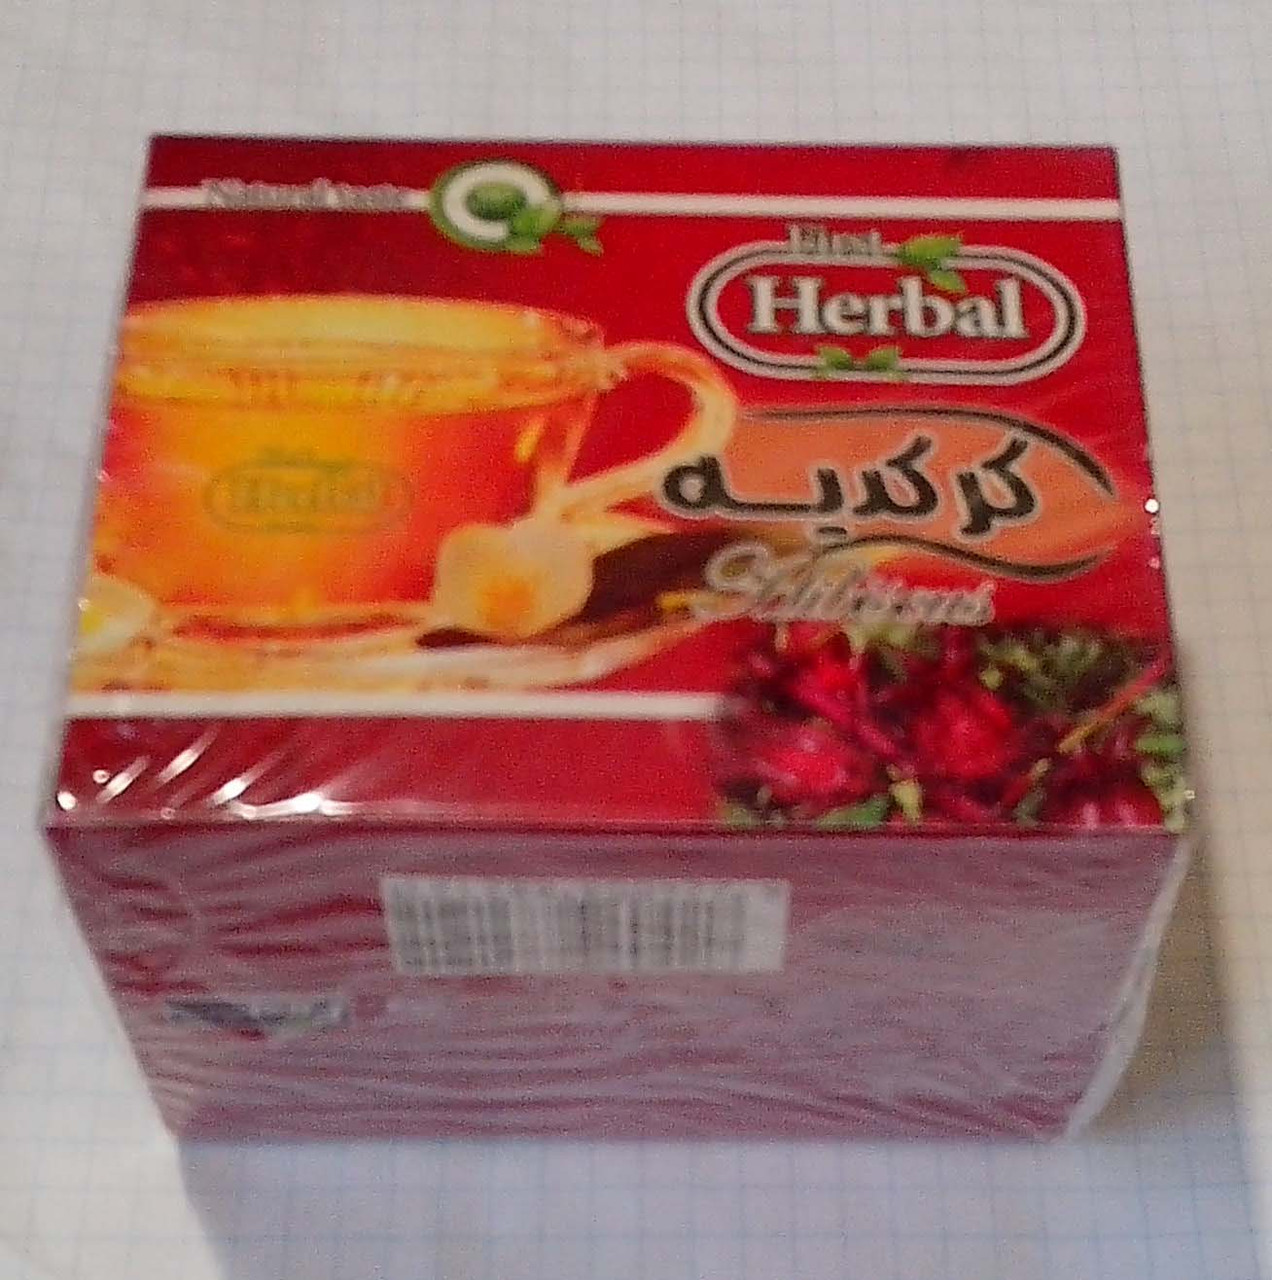 Чай каркаде 12 пакетиків по 2г First Herbal Єгипет